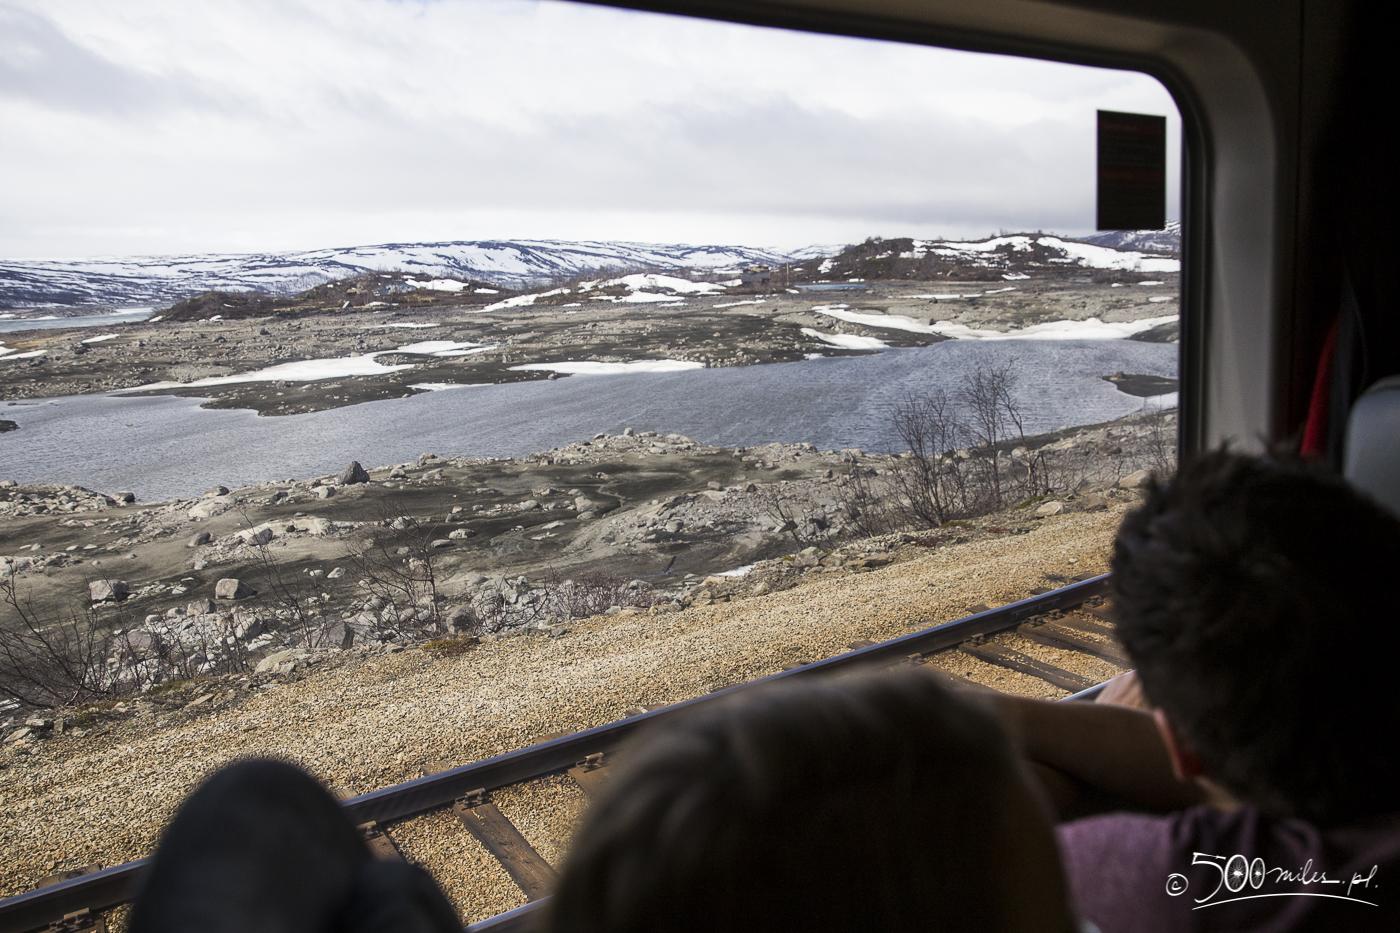 Oslo-Bergen train ride - view through the window